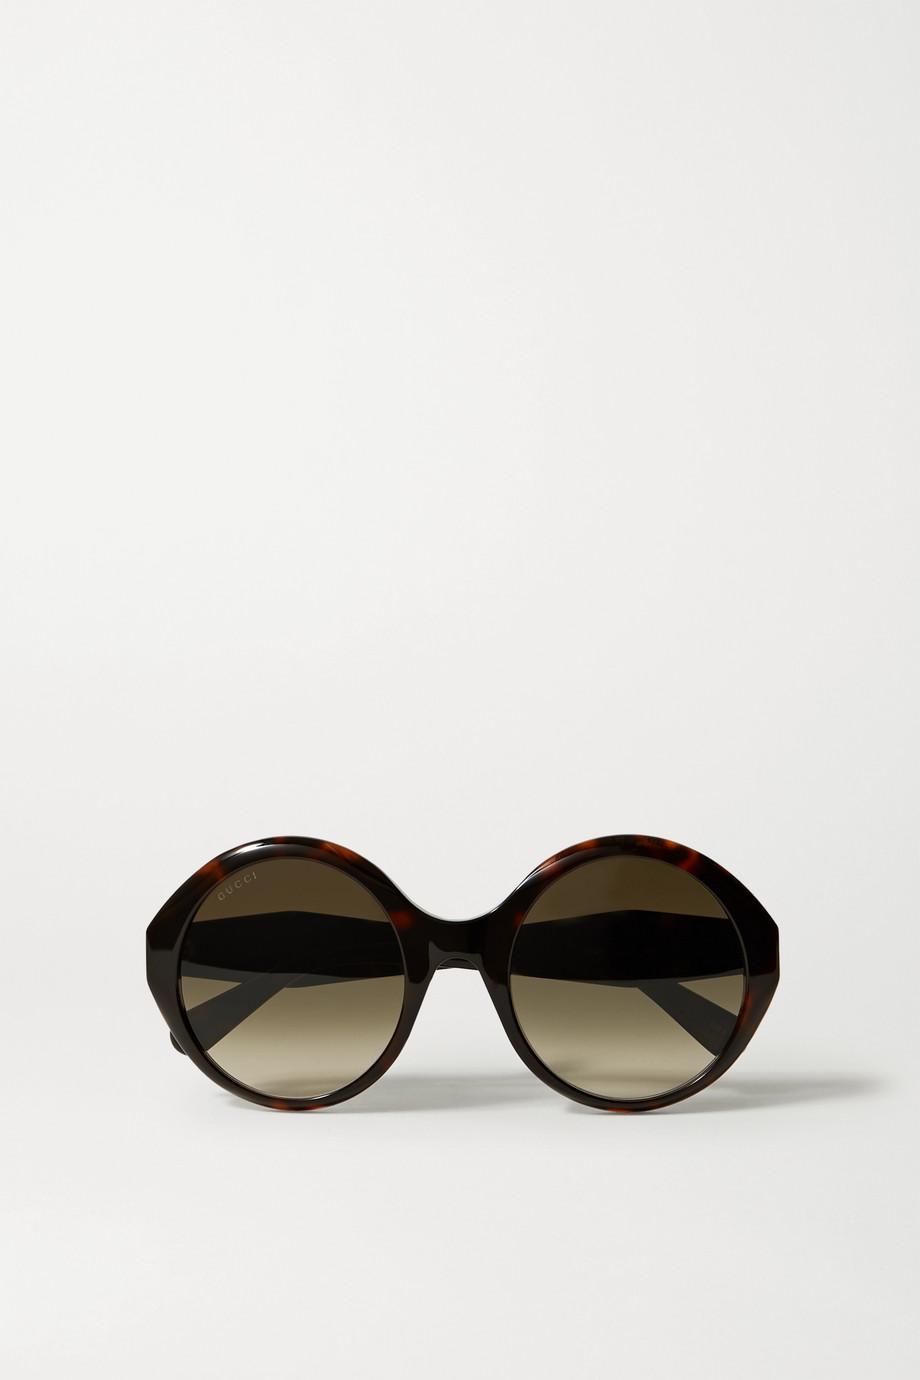 Gucci Oversized round-frame tortoiseshell acetate sunglasses